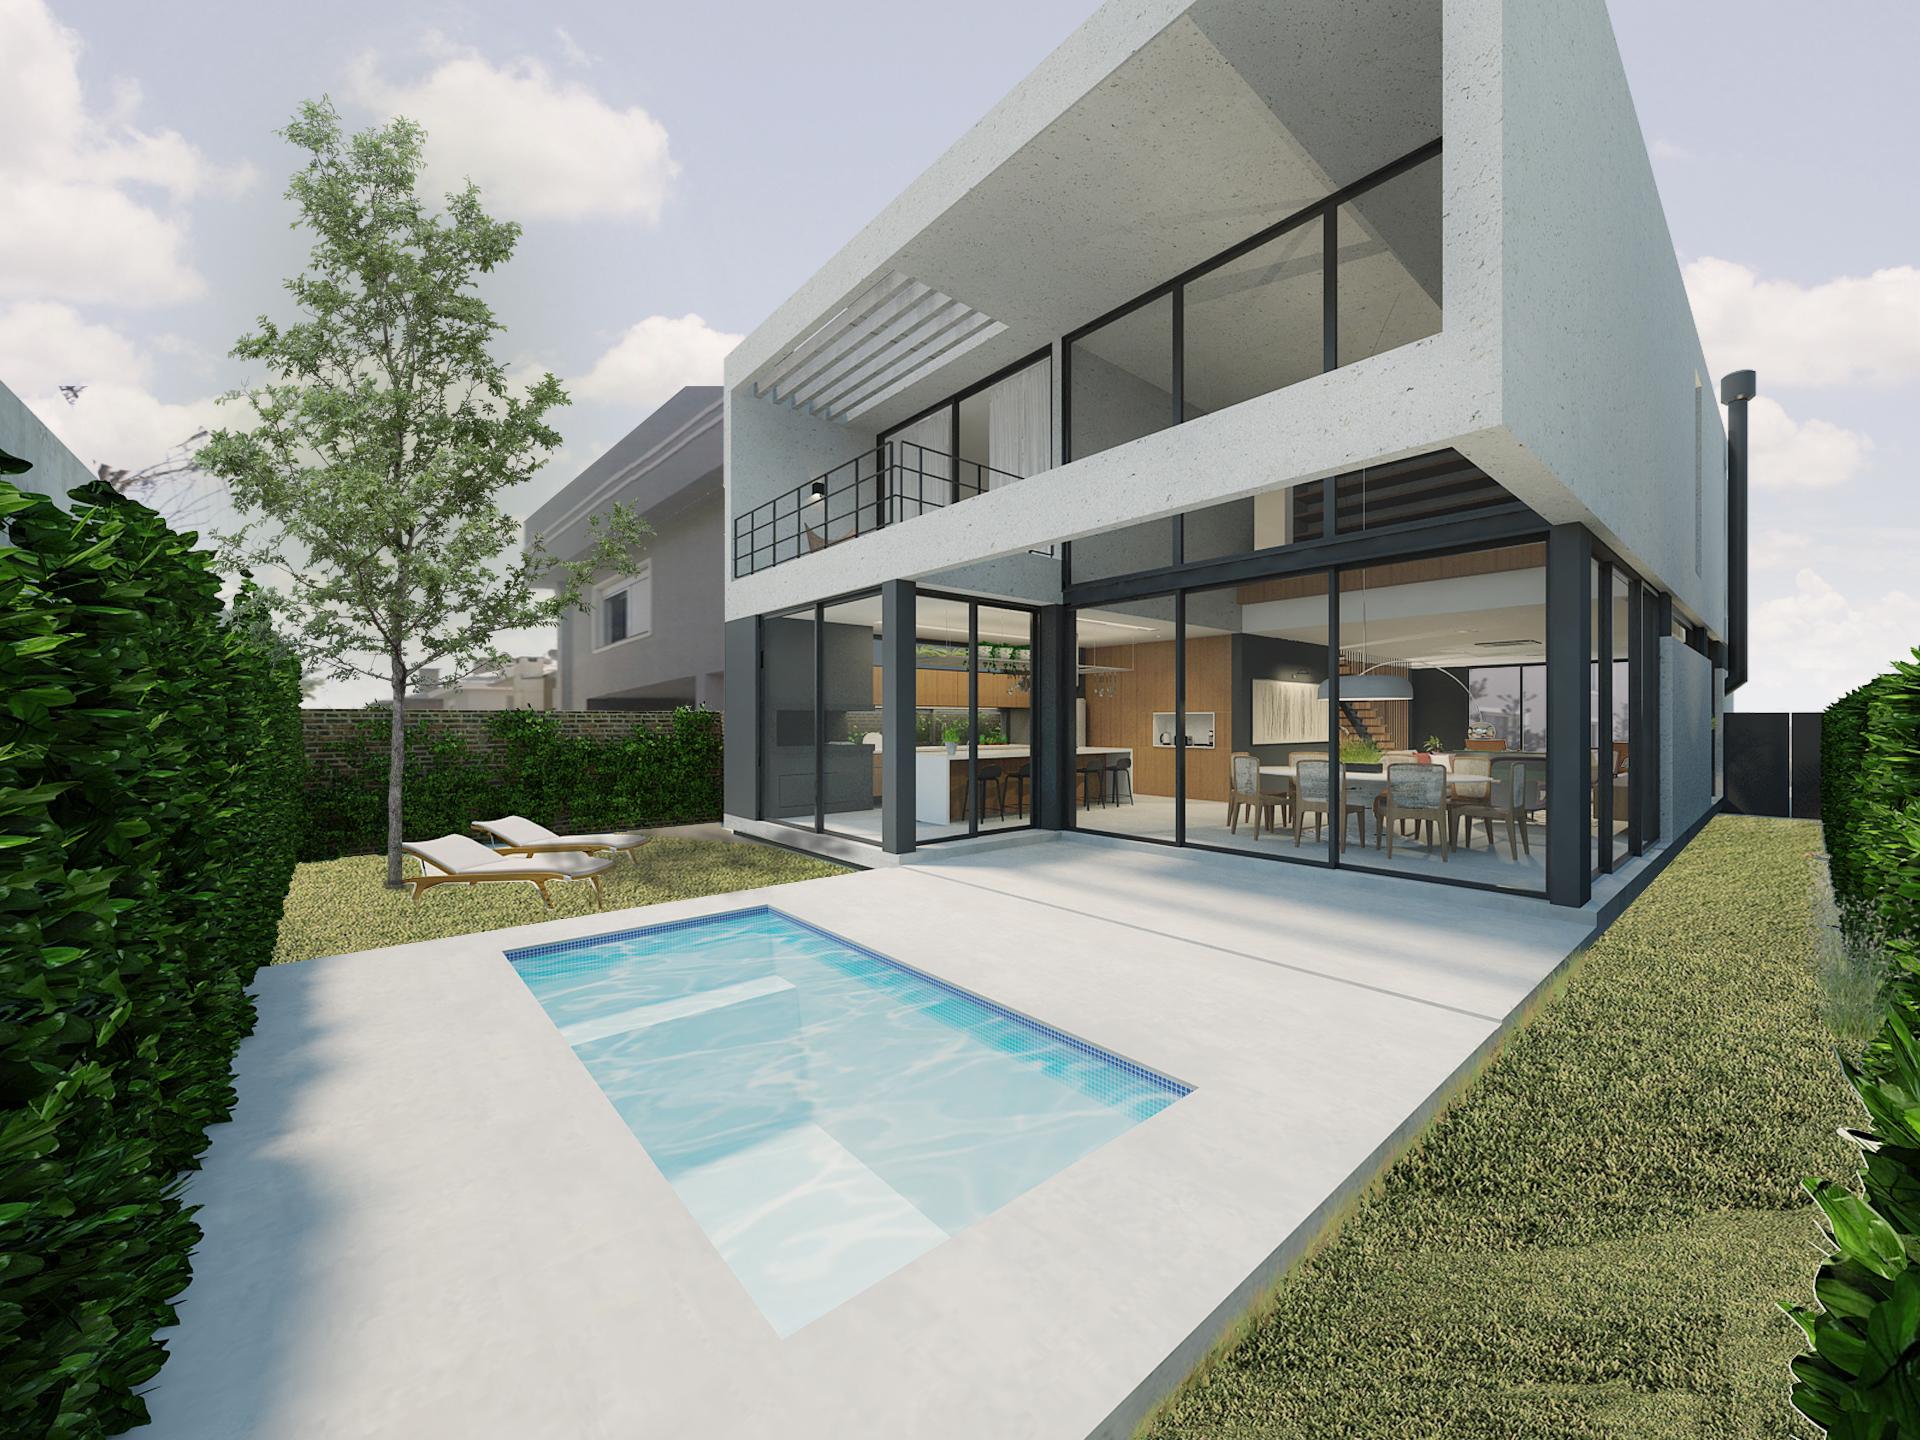 casa coracini | fachada posterior